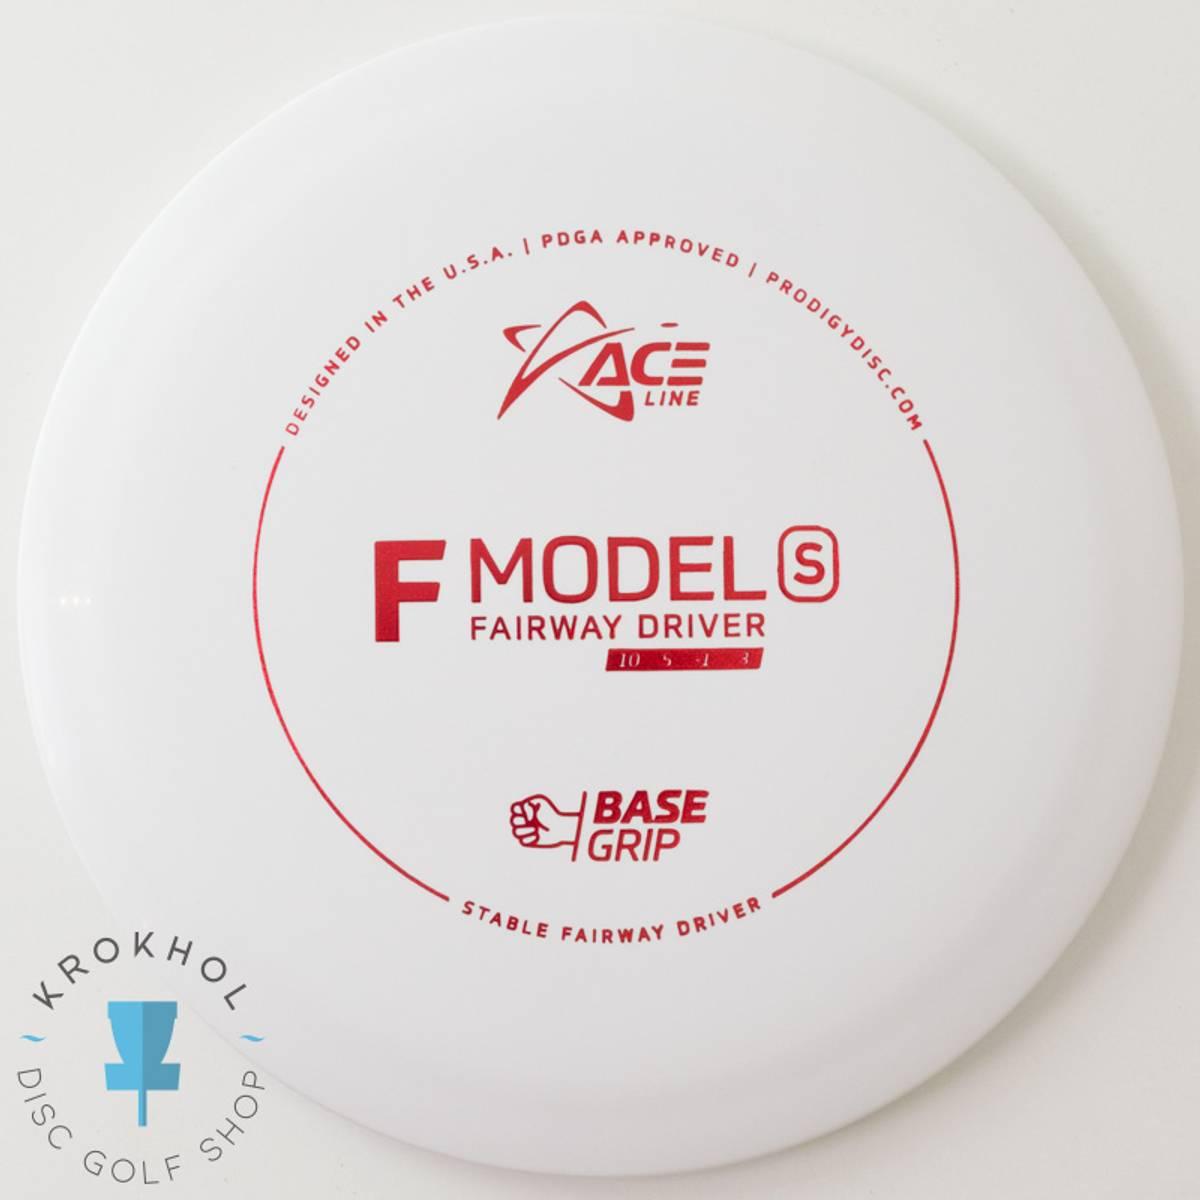 BaseGrip F Model S